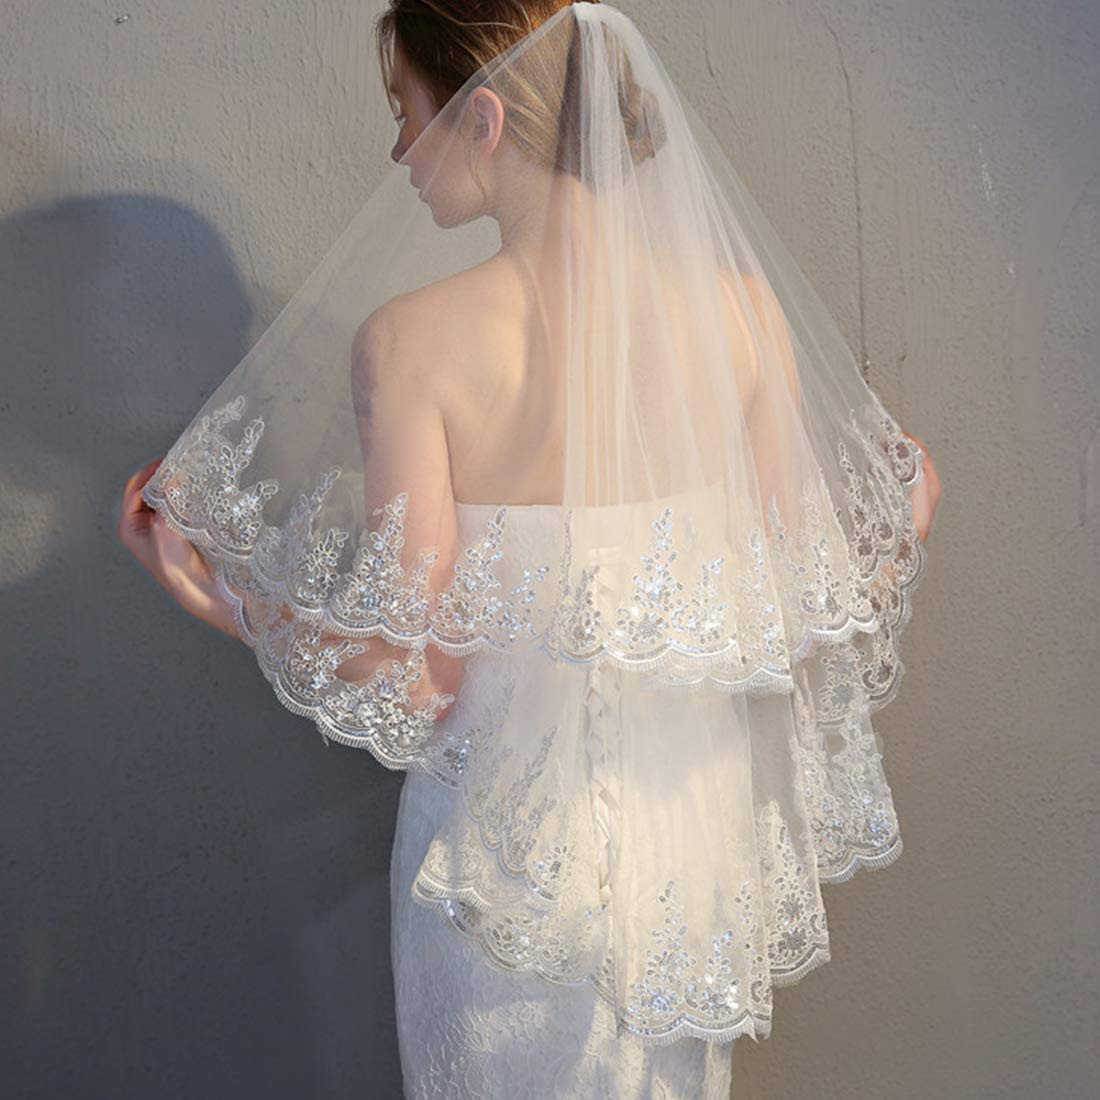 Kalos Dress Shop 2 Tier Lace Silver Lined Beaded Edge Fingertip Length Bridal Wedding Veil